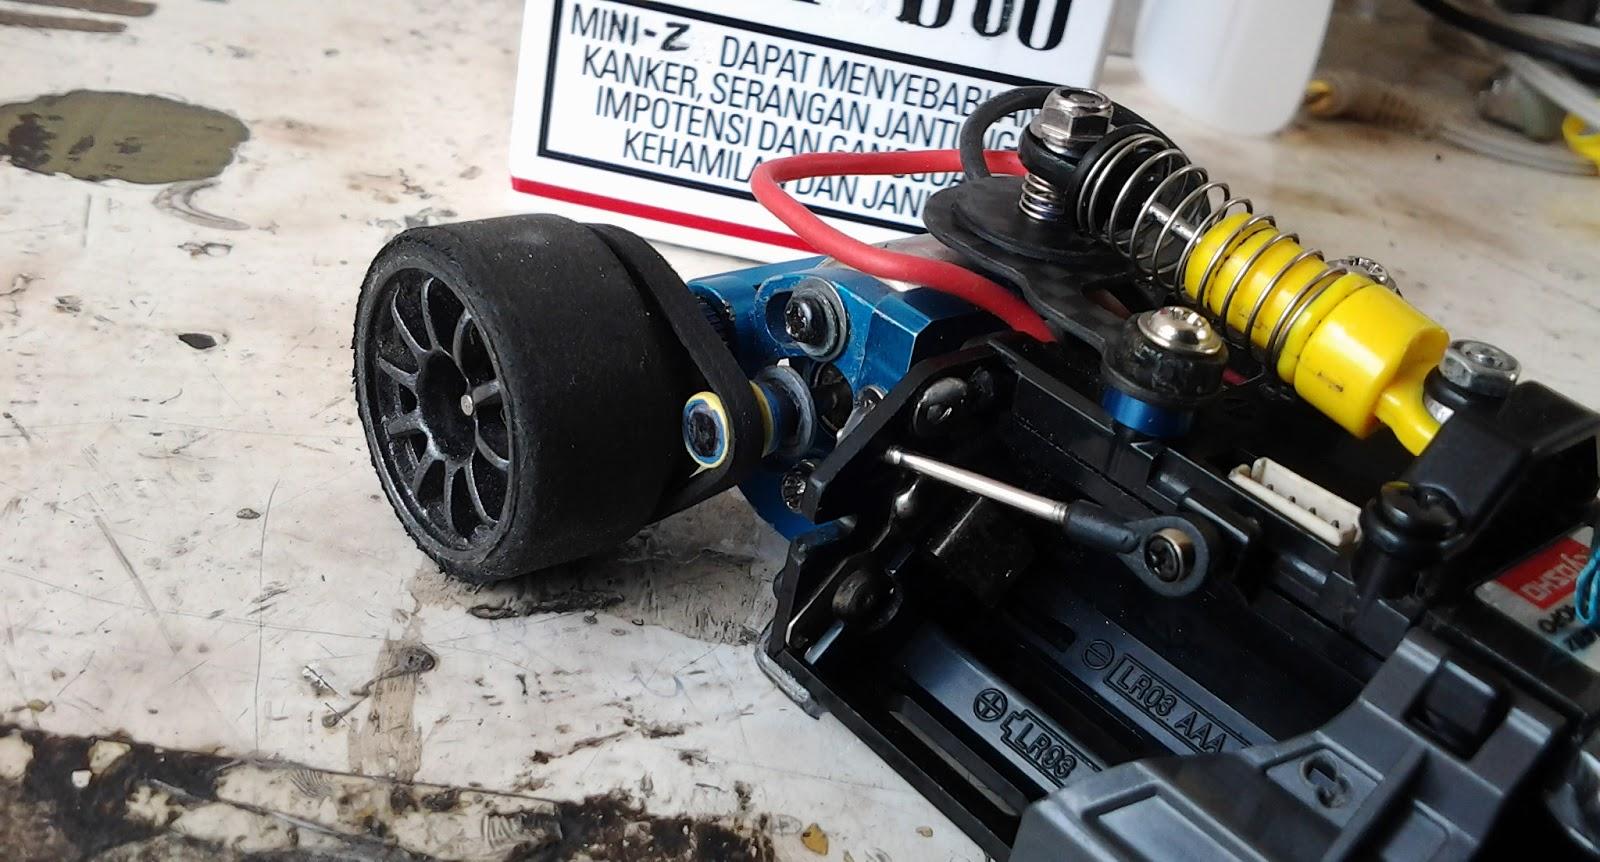 Kyoshosan Mini Z Mr 03 Belt Driven Mod Pn Racing V2 Rc Printed Circuit Board Assembly Mr03 Setting Thank You